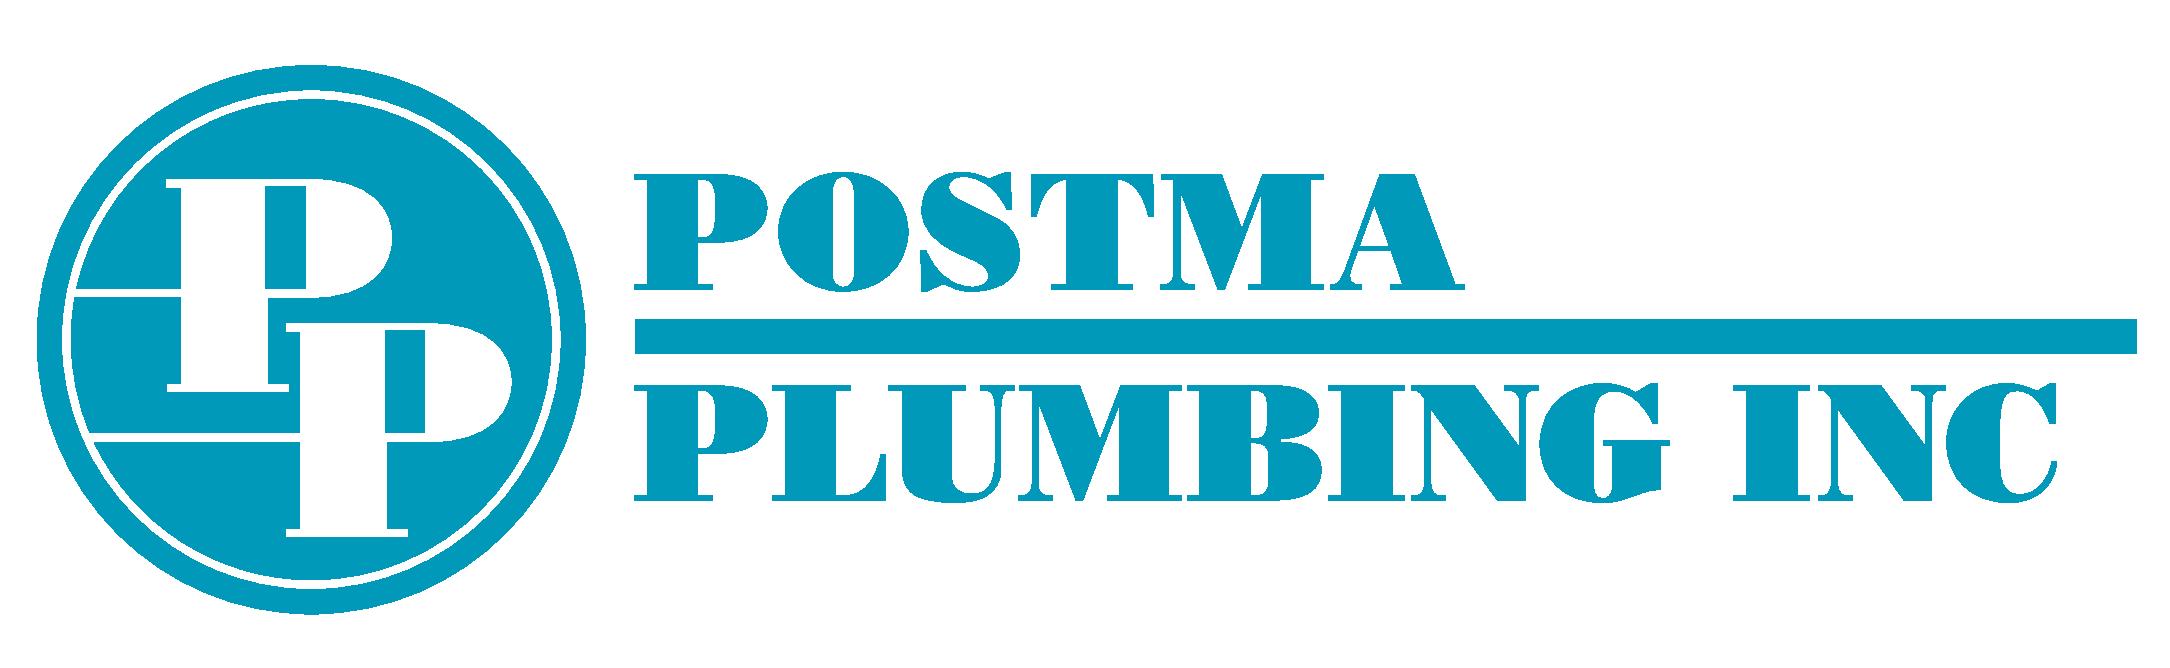 Postma Plumbing Inc in Plymouth